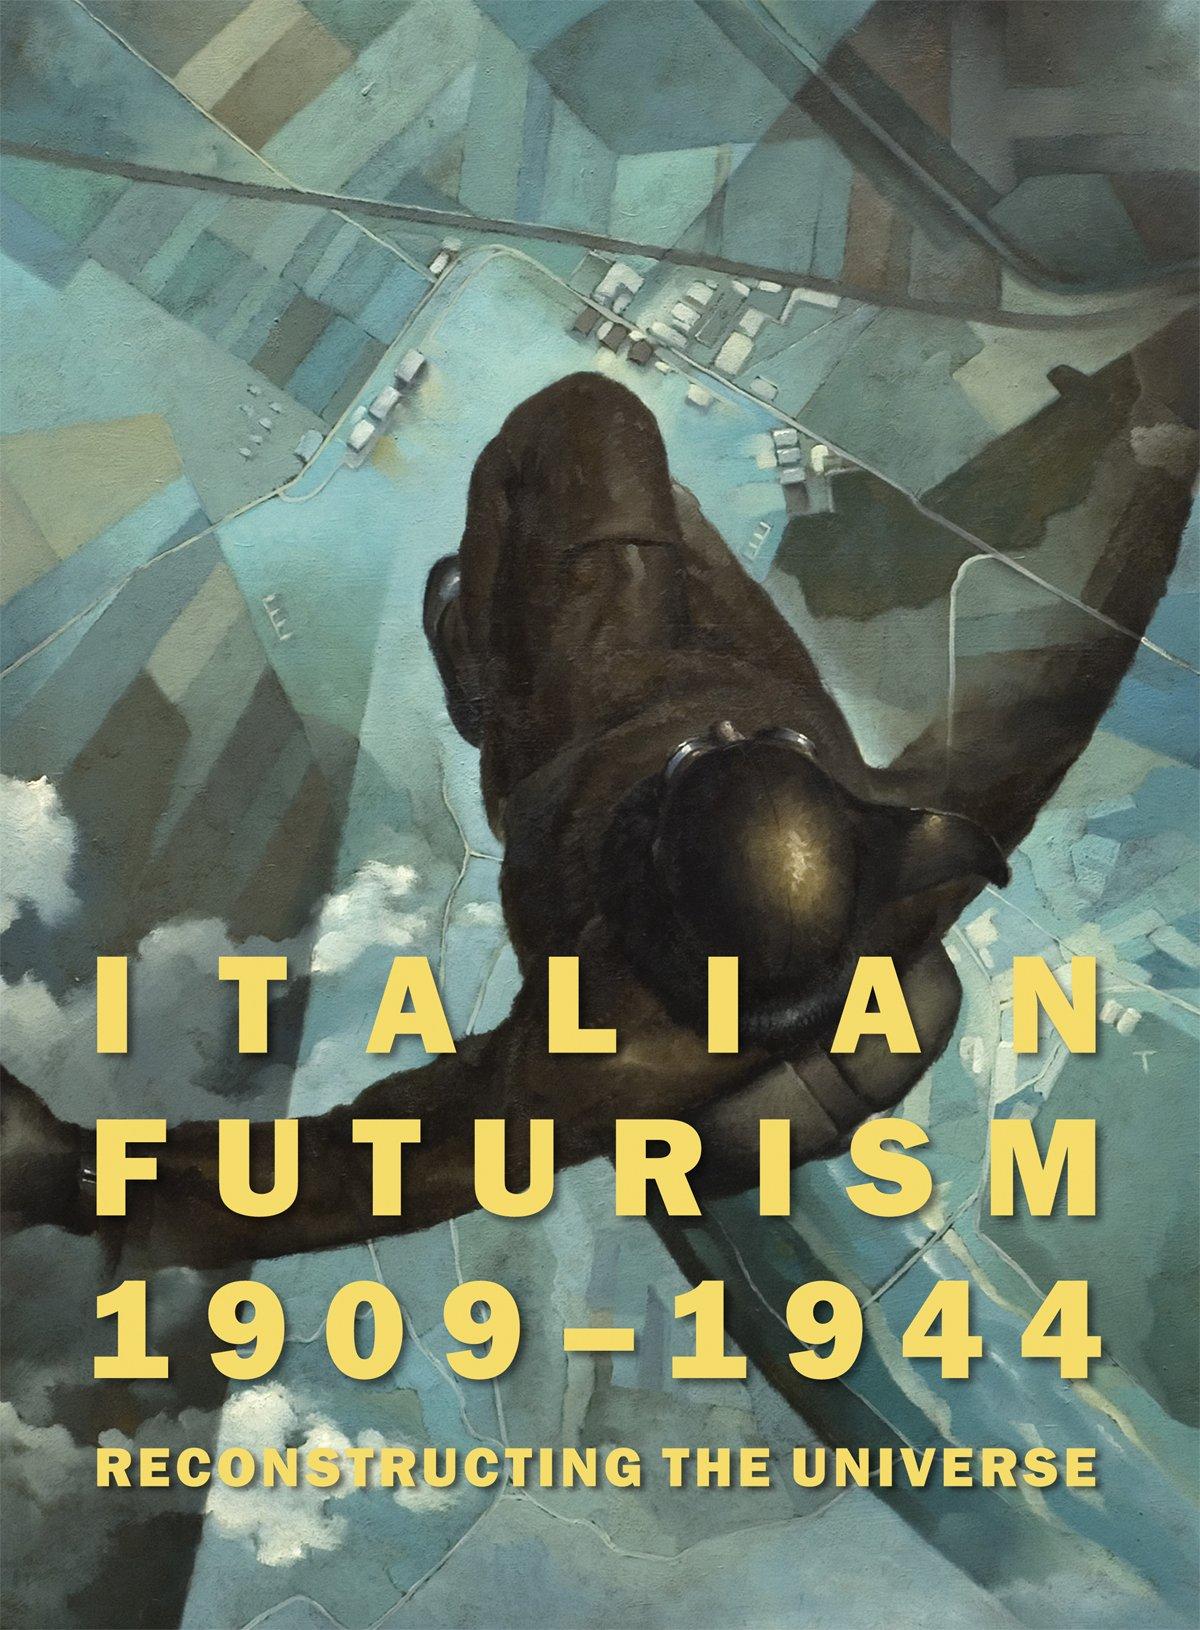 Italian Futurism, 1909-1944: Reconstructing the Universe (Guggenheim Museum, New York: Exhibition Catalogues) pdf